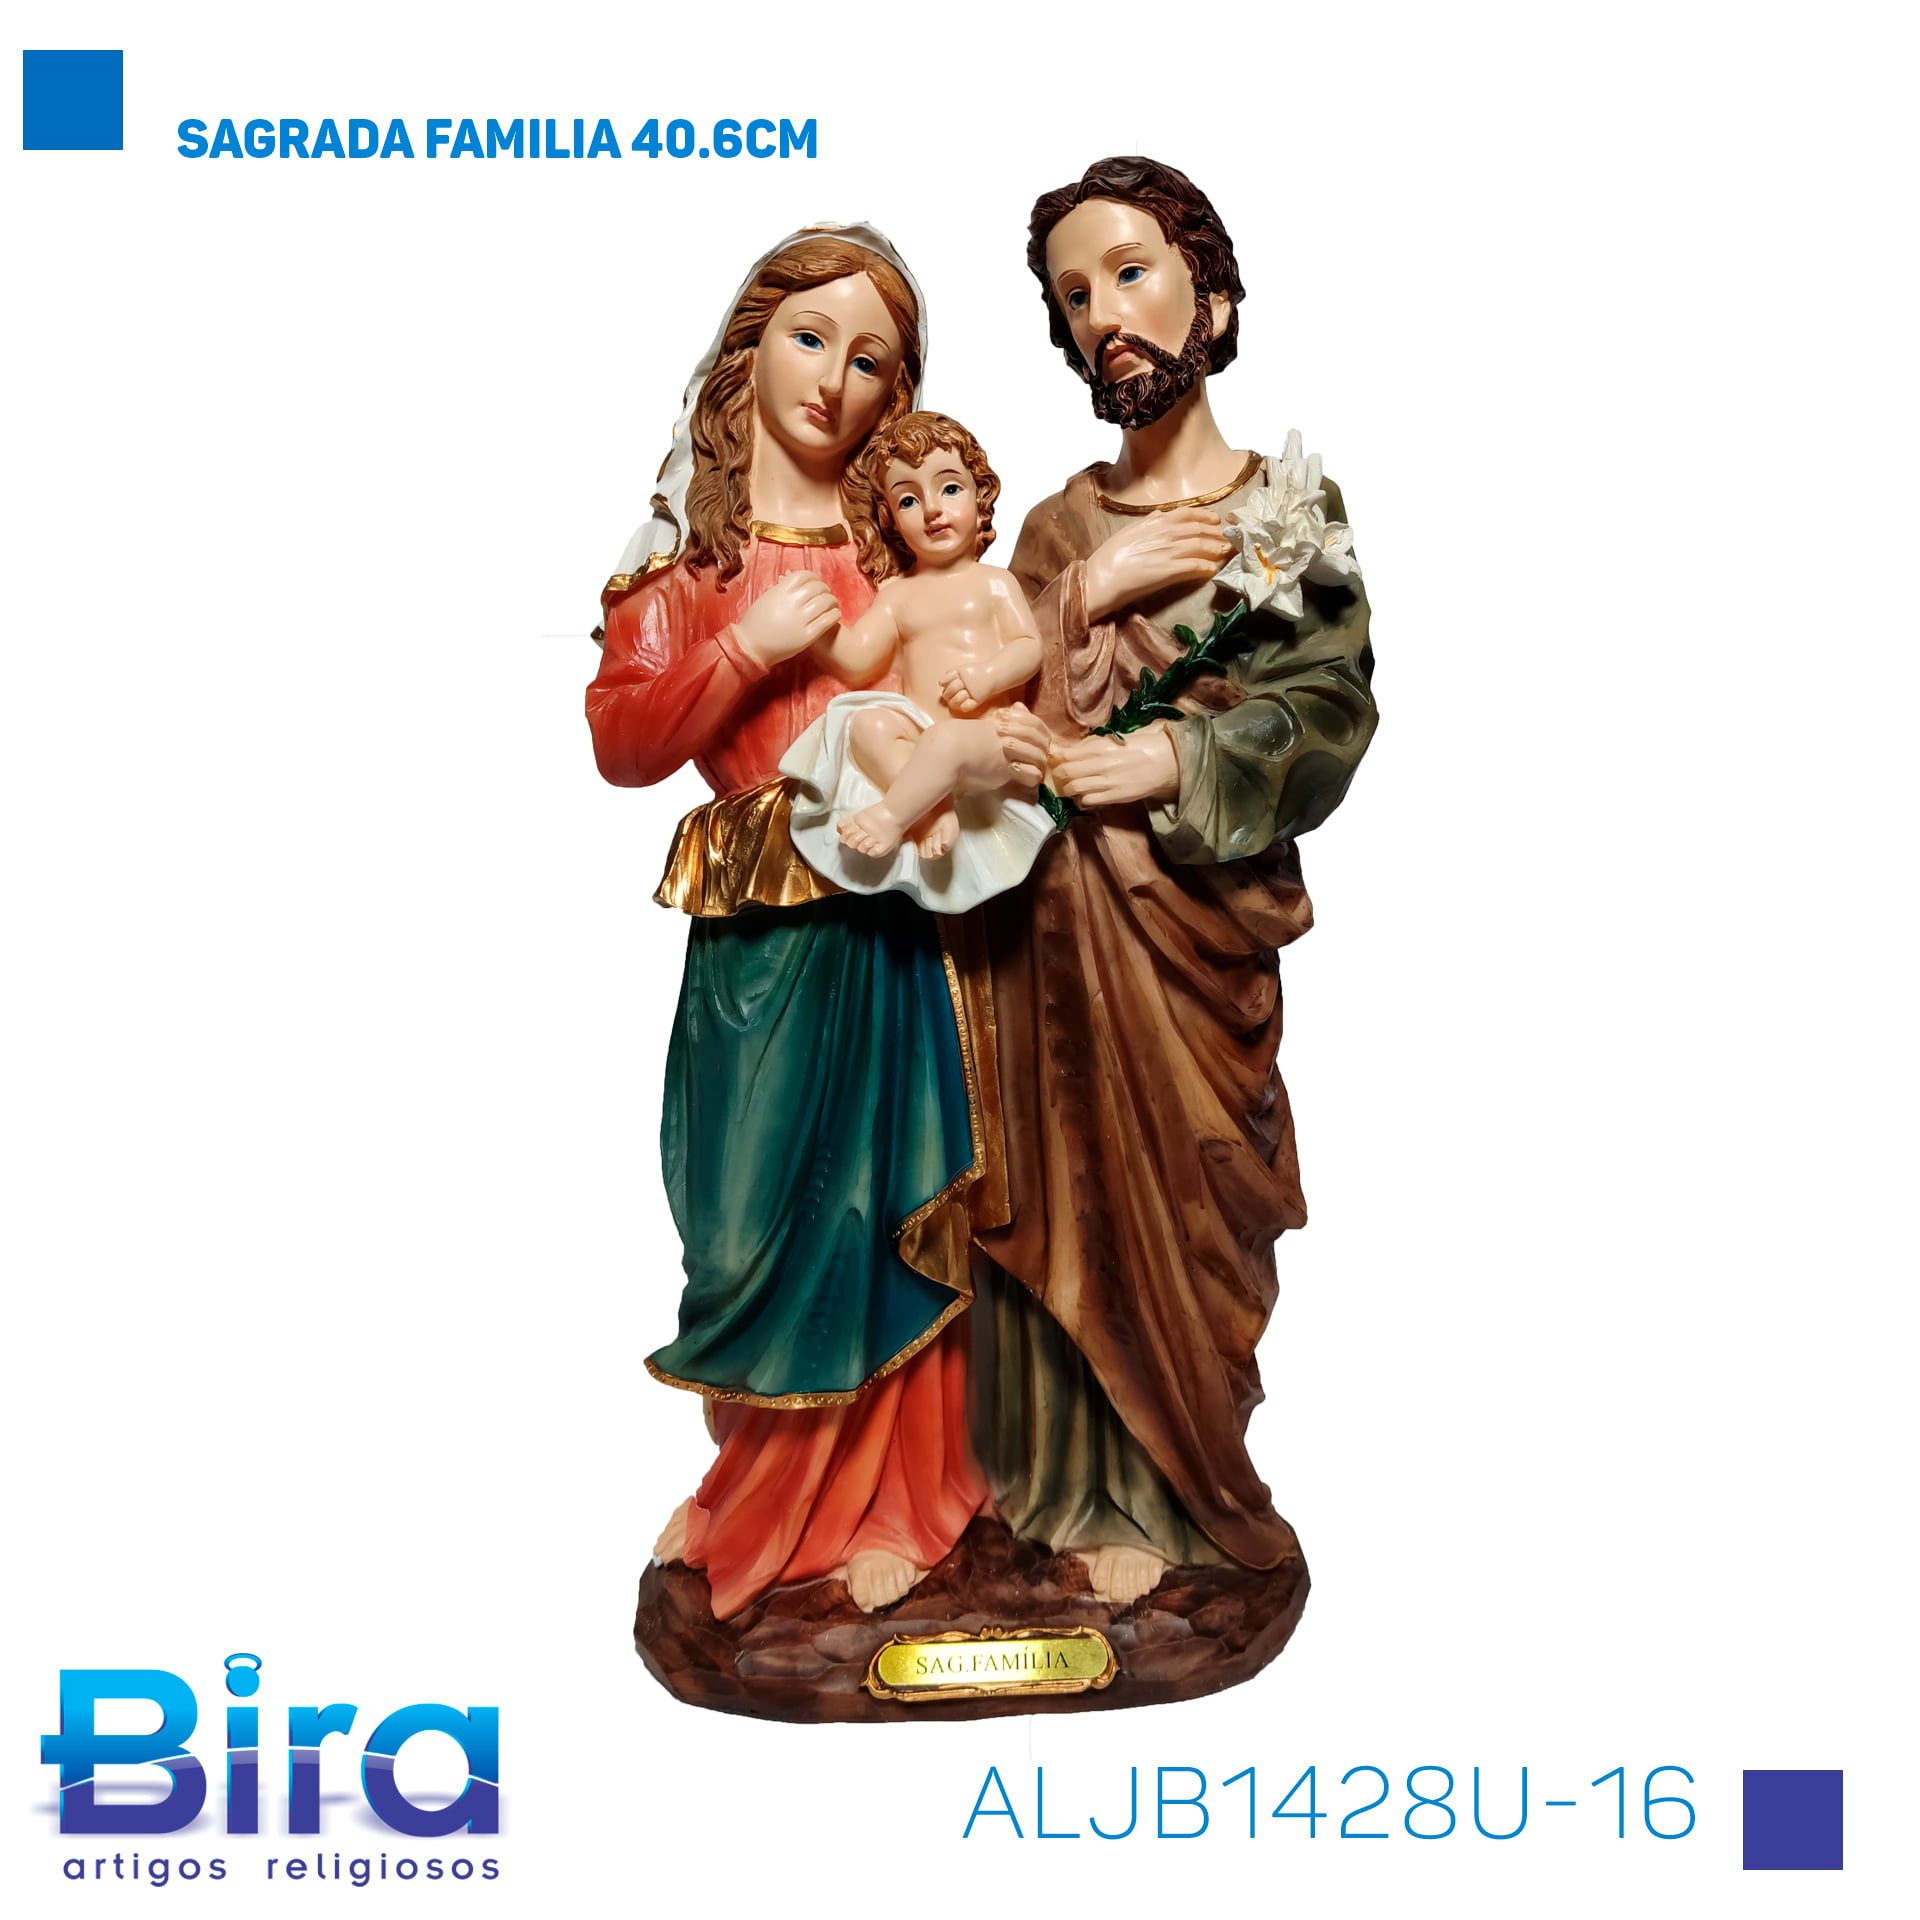 Bira Artigos Religiosos - SAGRADA FAMILIA 40.6CM Cód. ALJB1428U-16